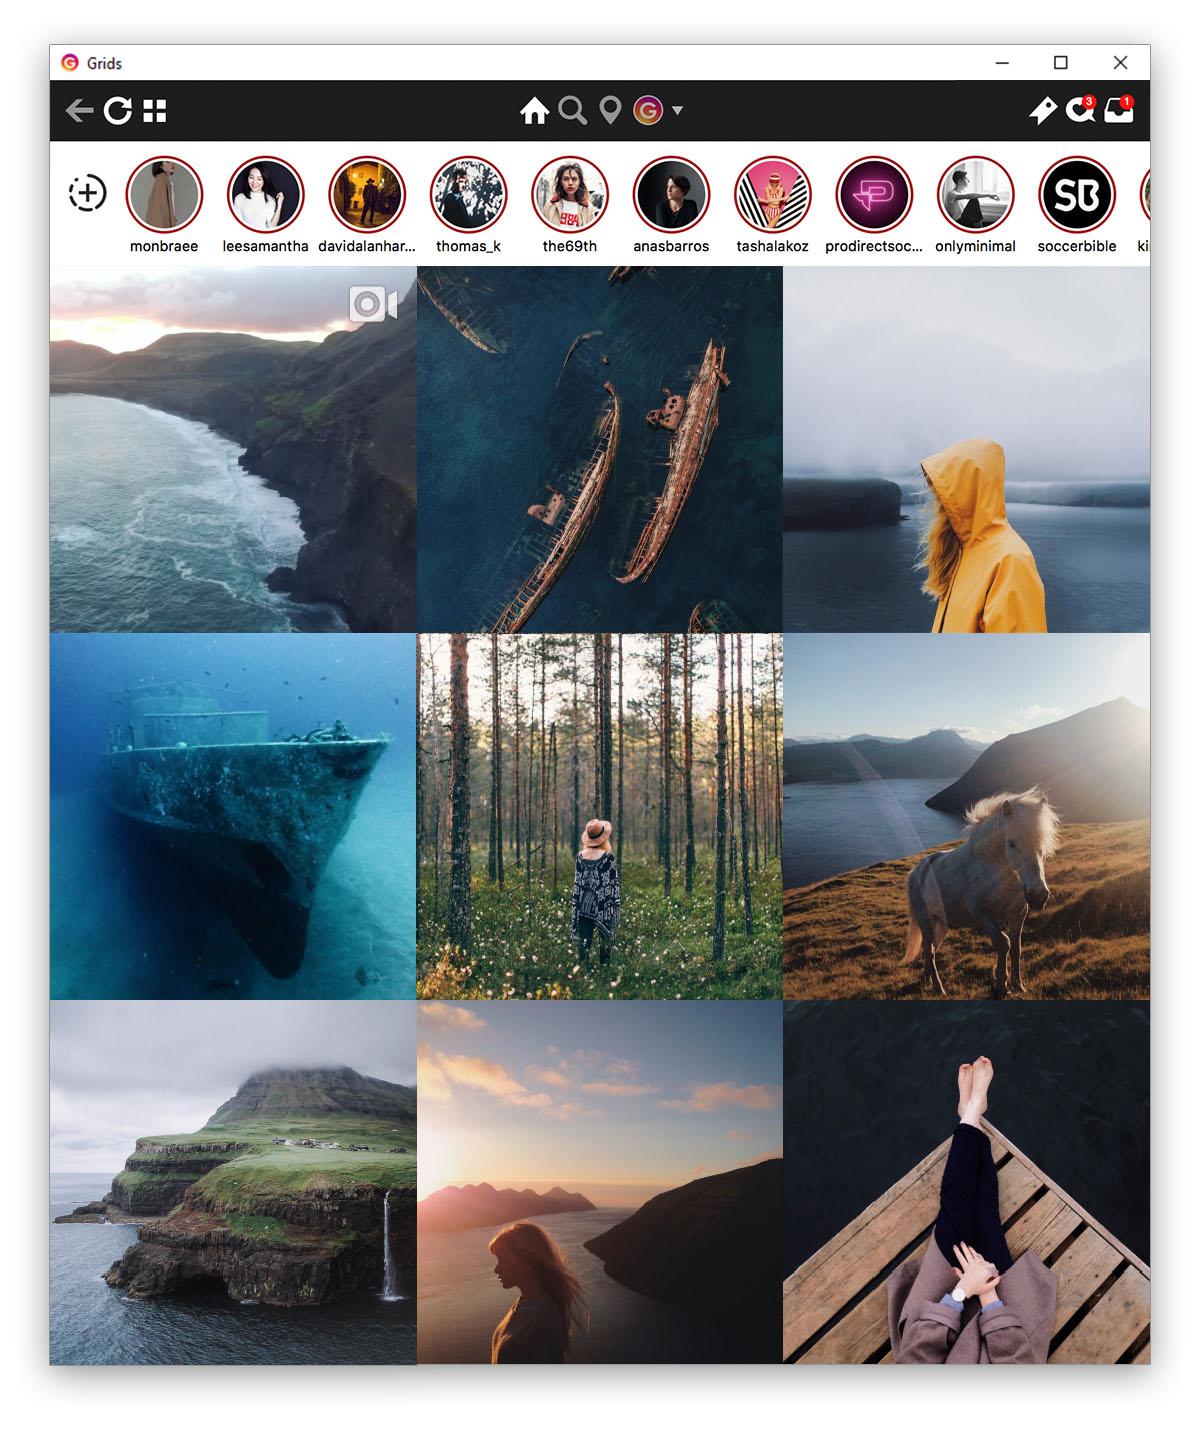 GET] GRIDS 4 6 Cracked Windows Instagram Client – Free